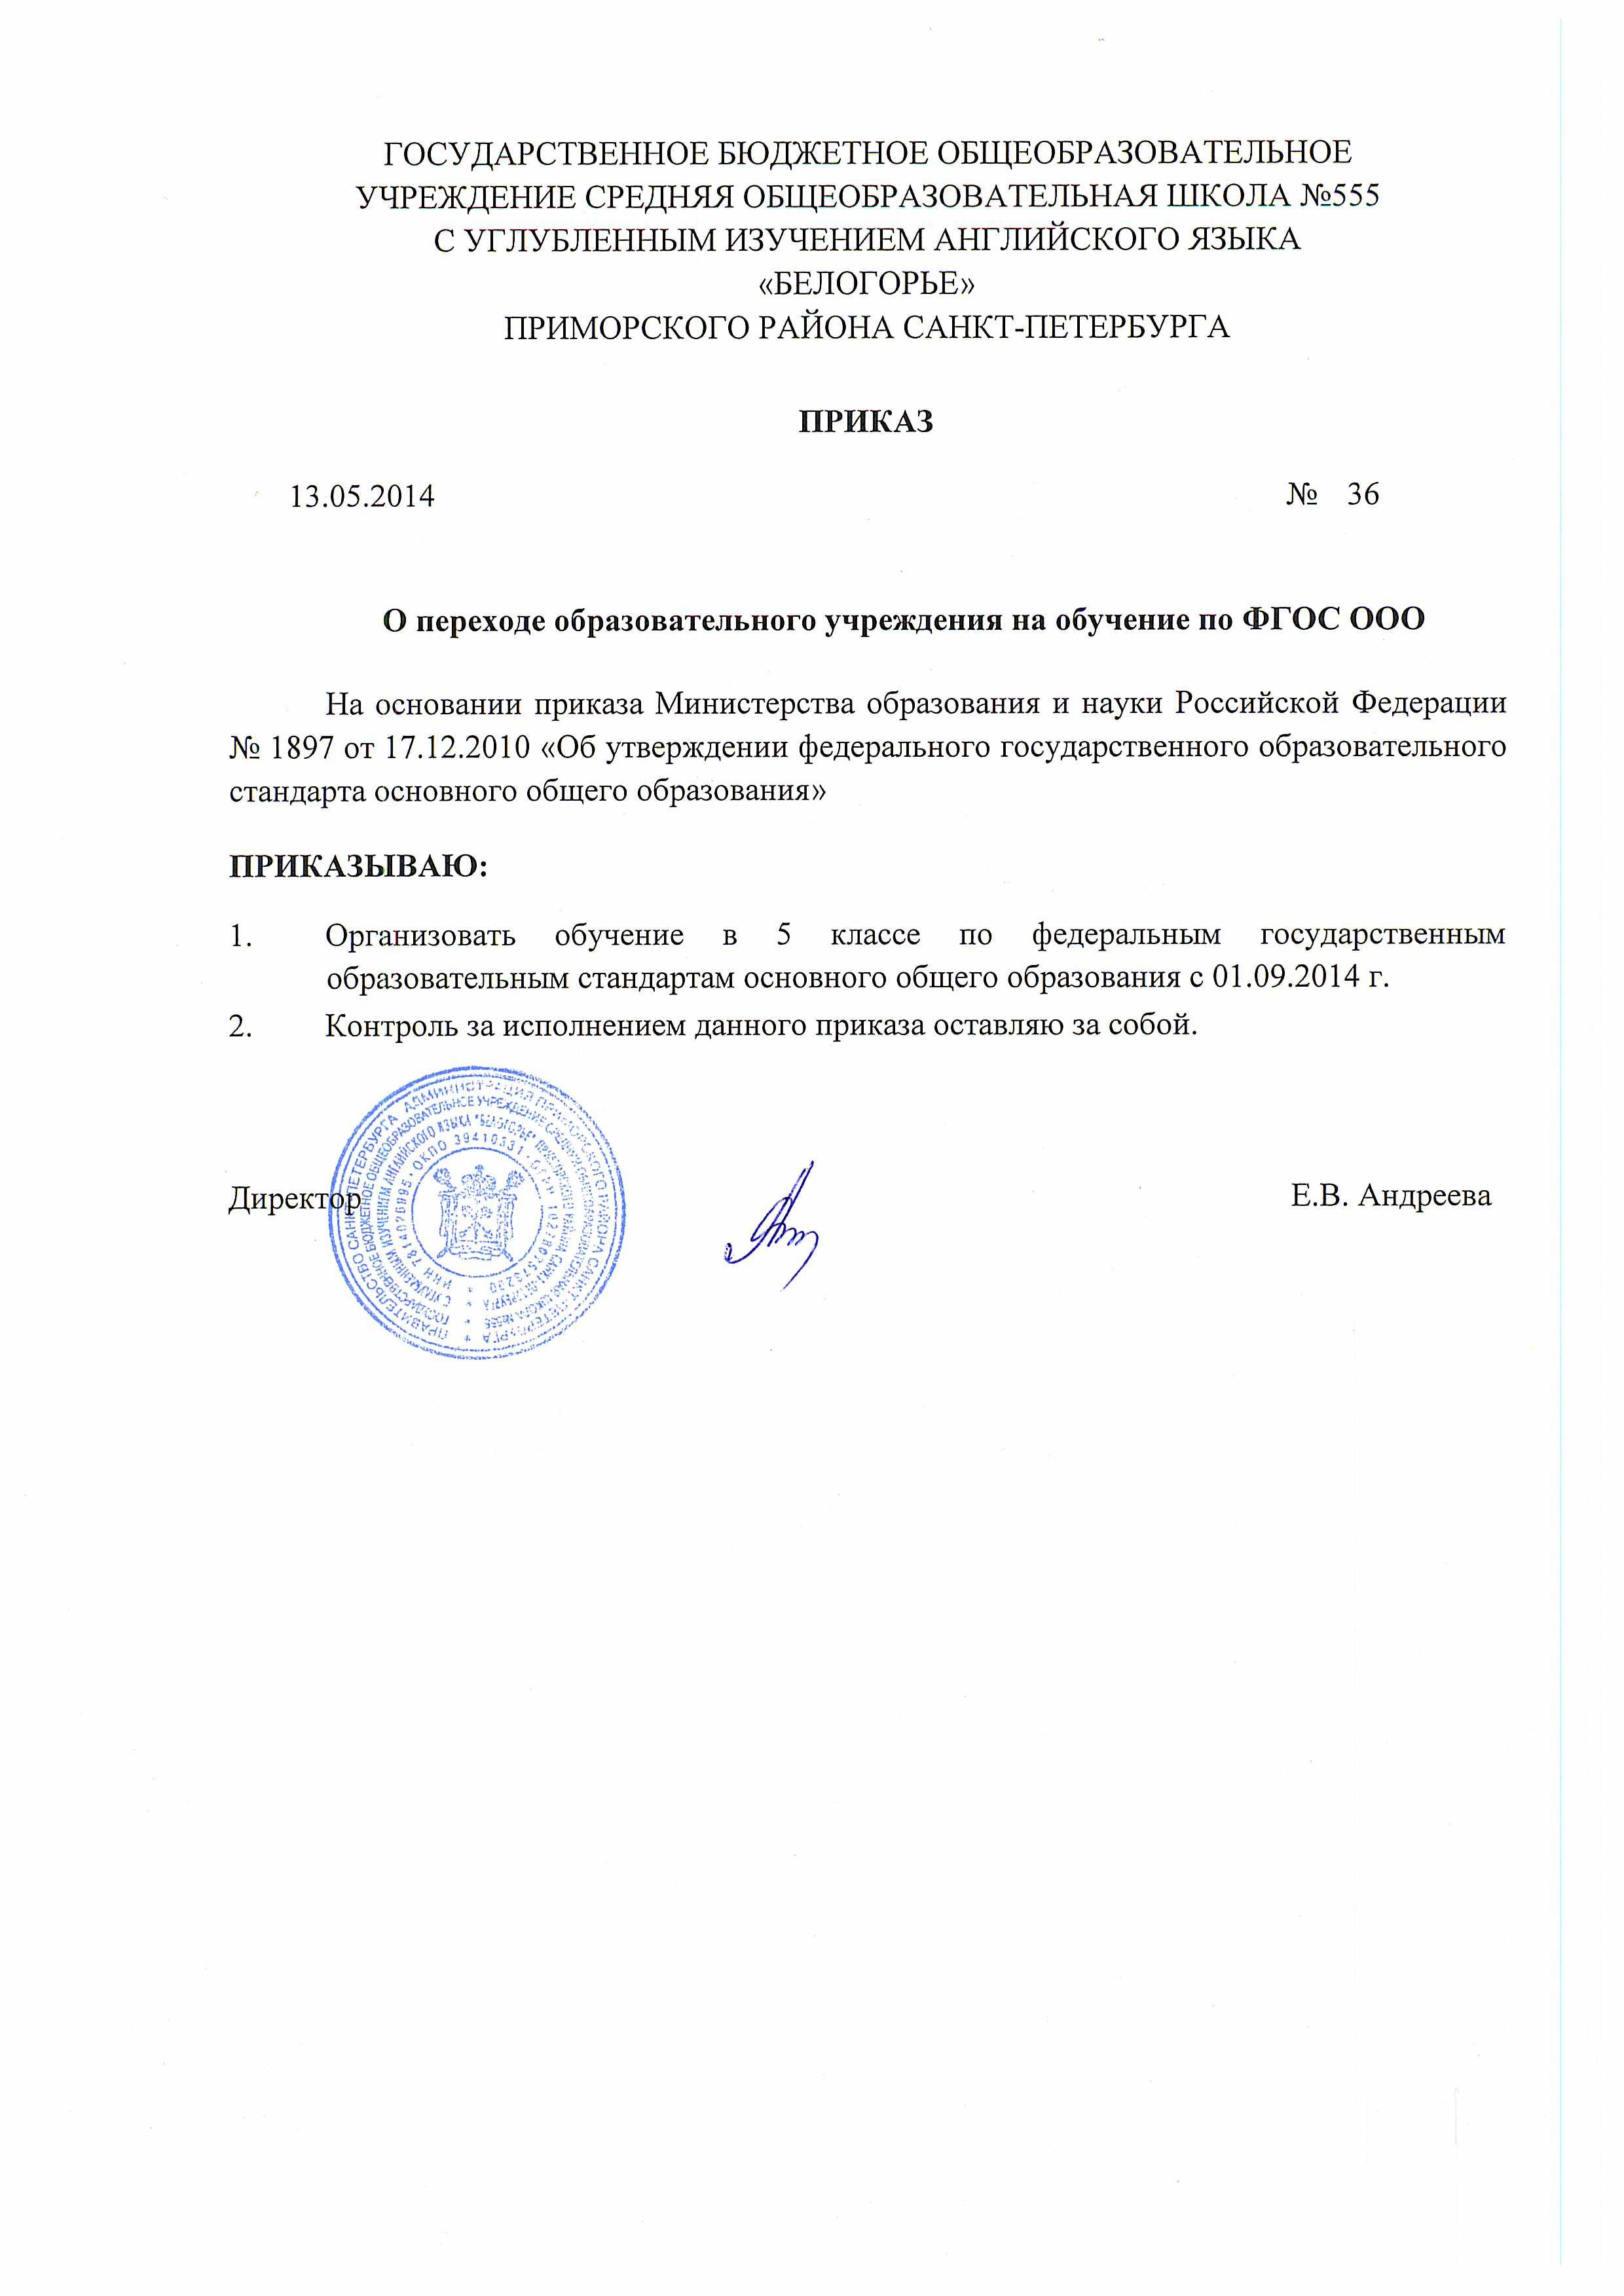 ГБОУ школа № Белогорье ФГОС О переходе на ФГОС ООО